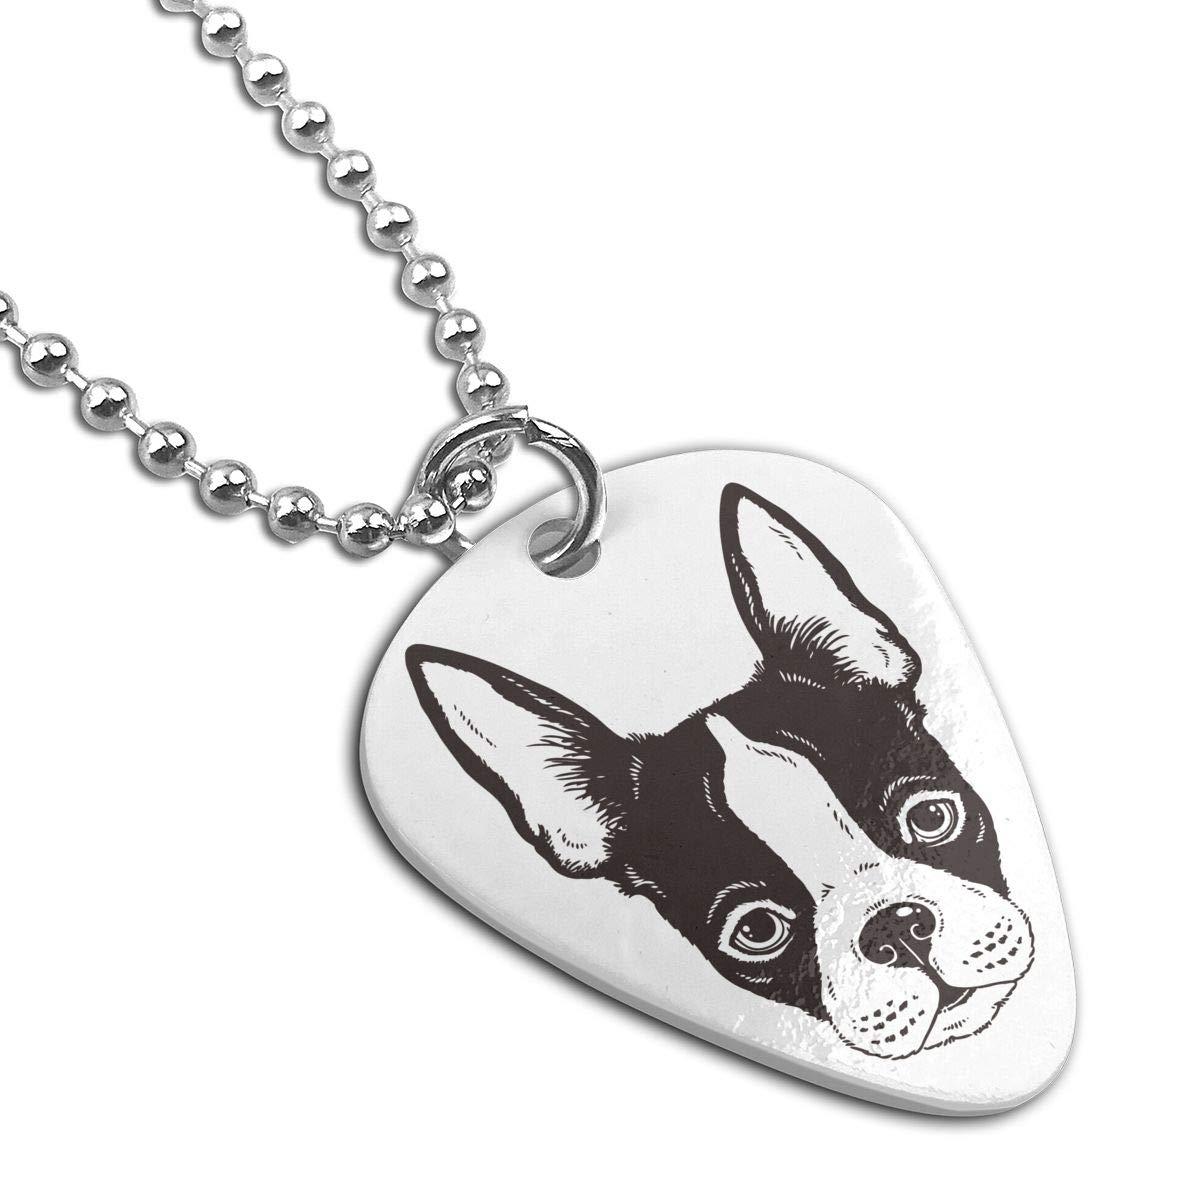 Boston Terrier Dogs Face Custom Guitar Pick Pendant Necklace Keychain